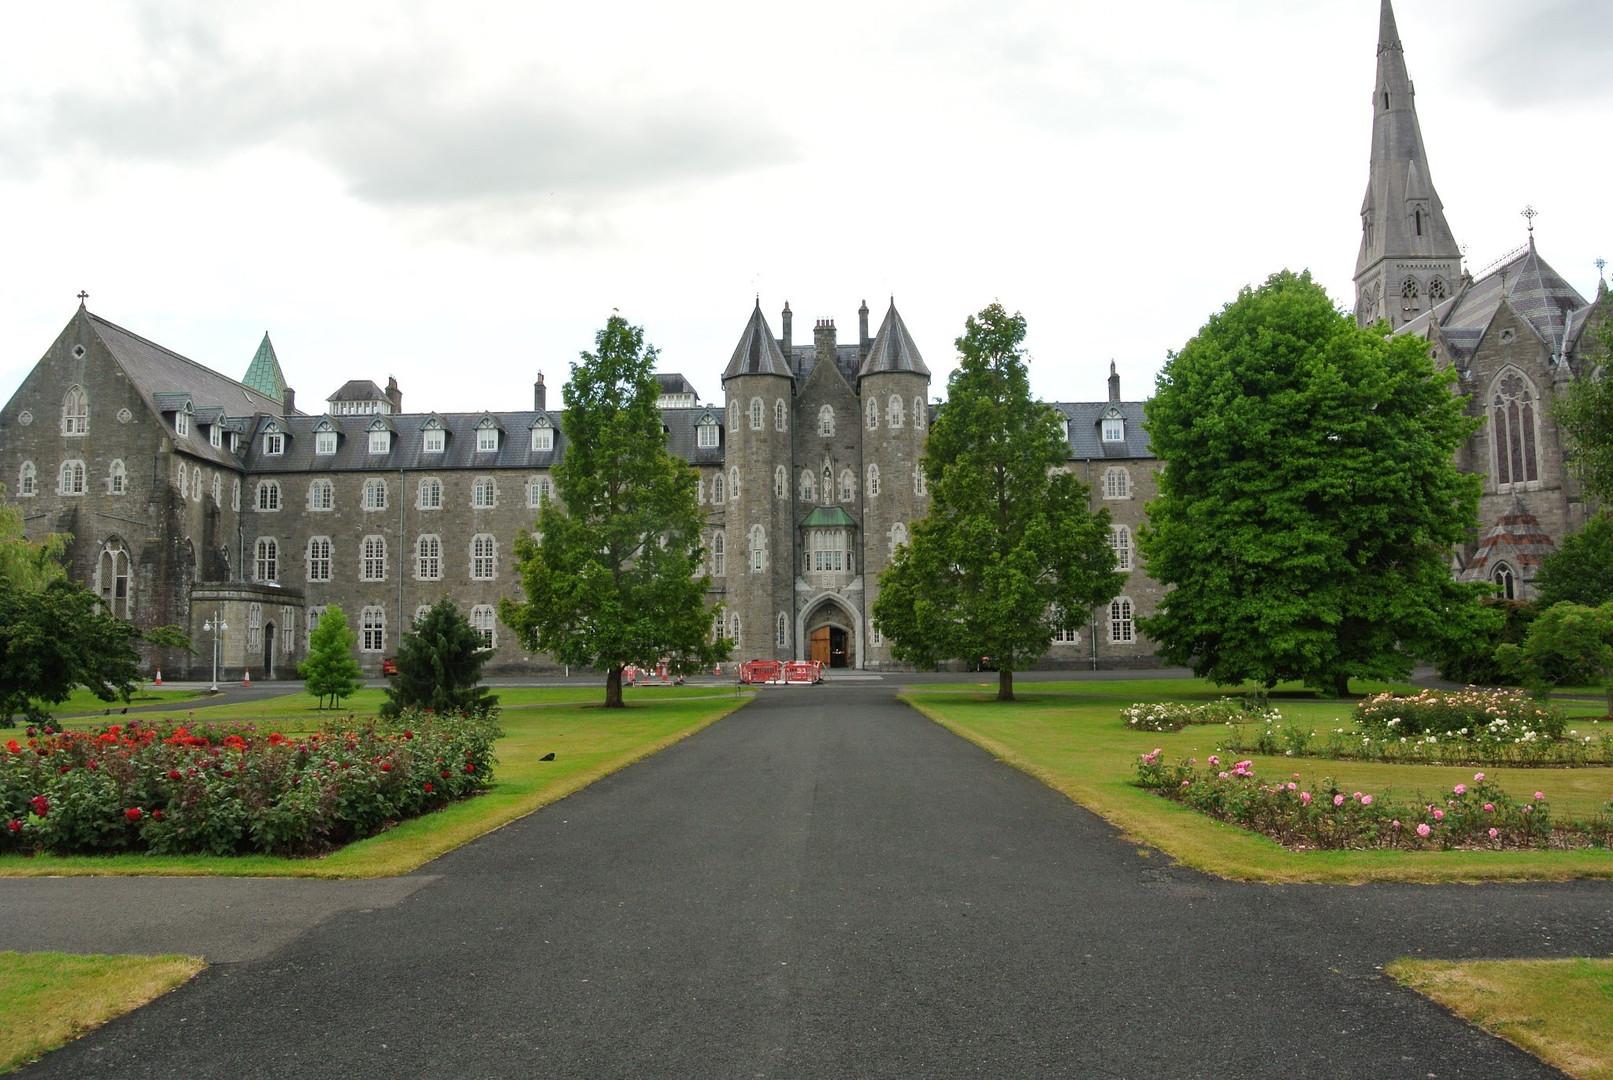 ATC - Maynooth University